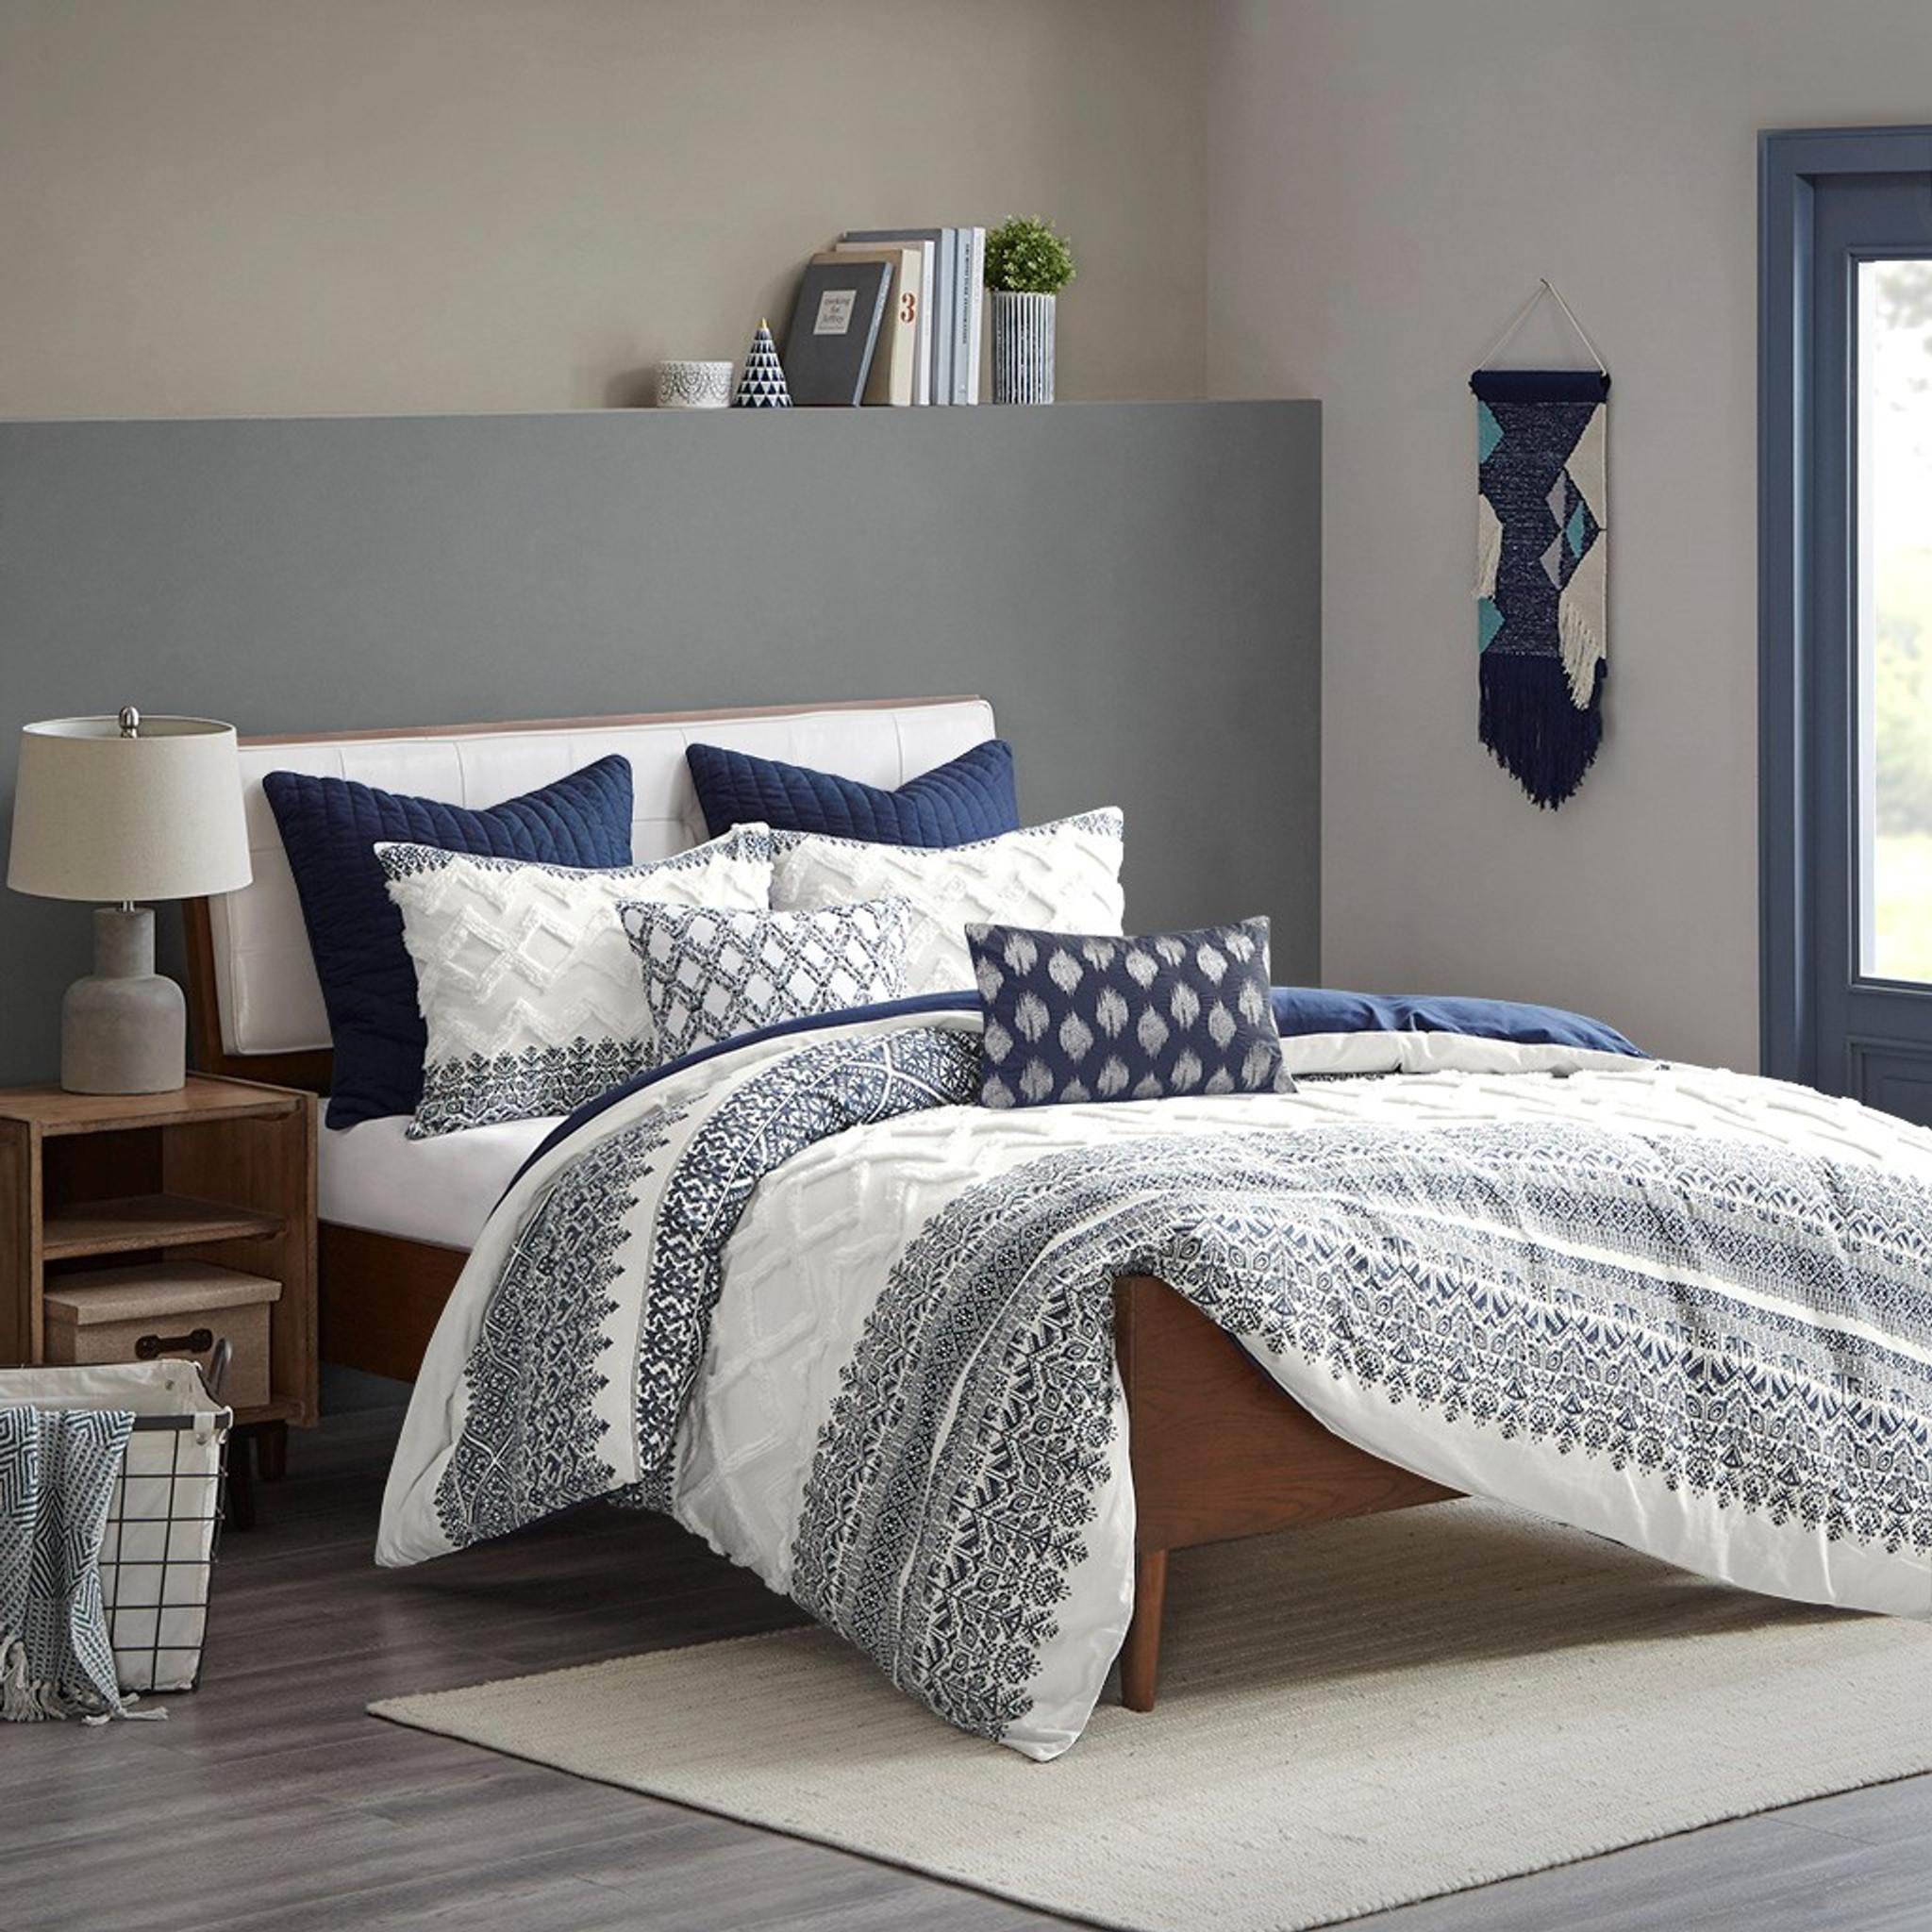 malibu boho navy and white comforter set king